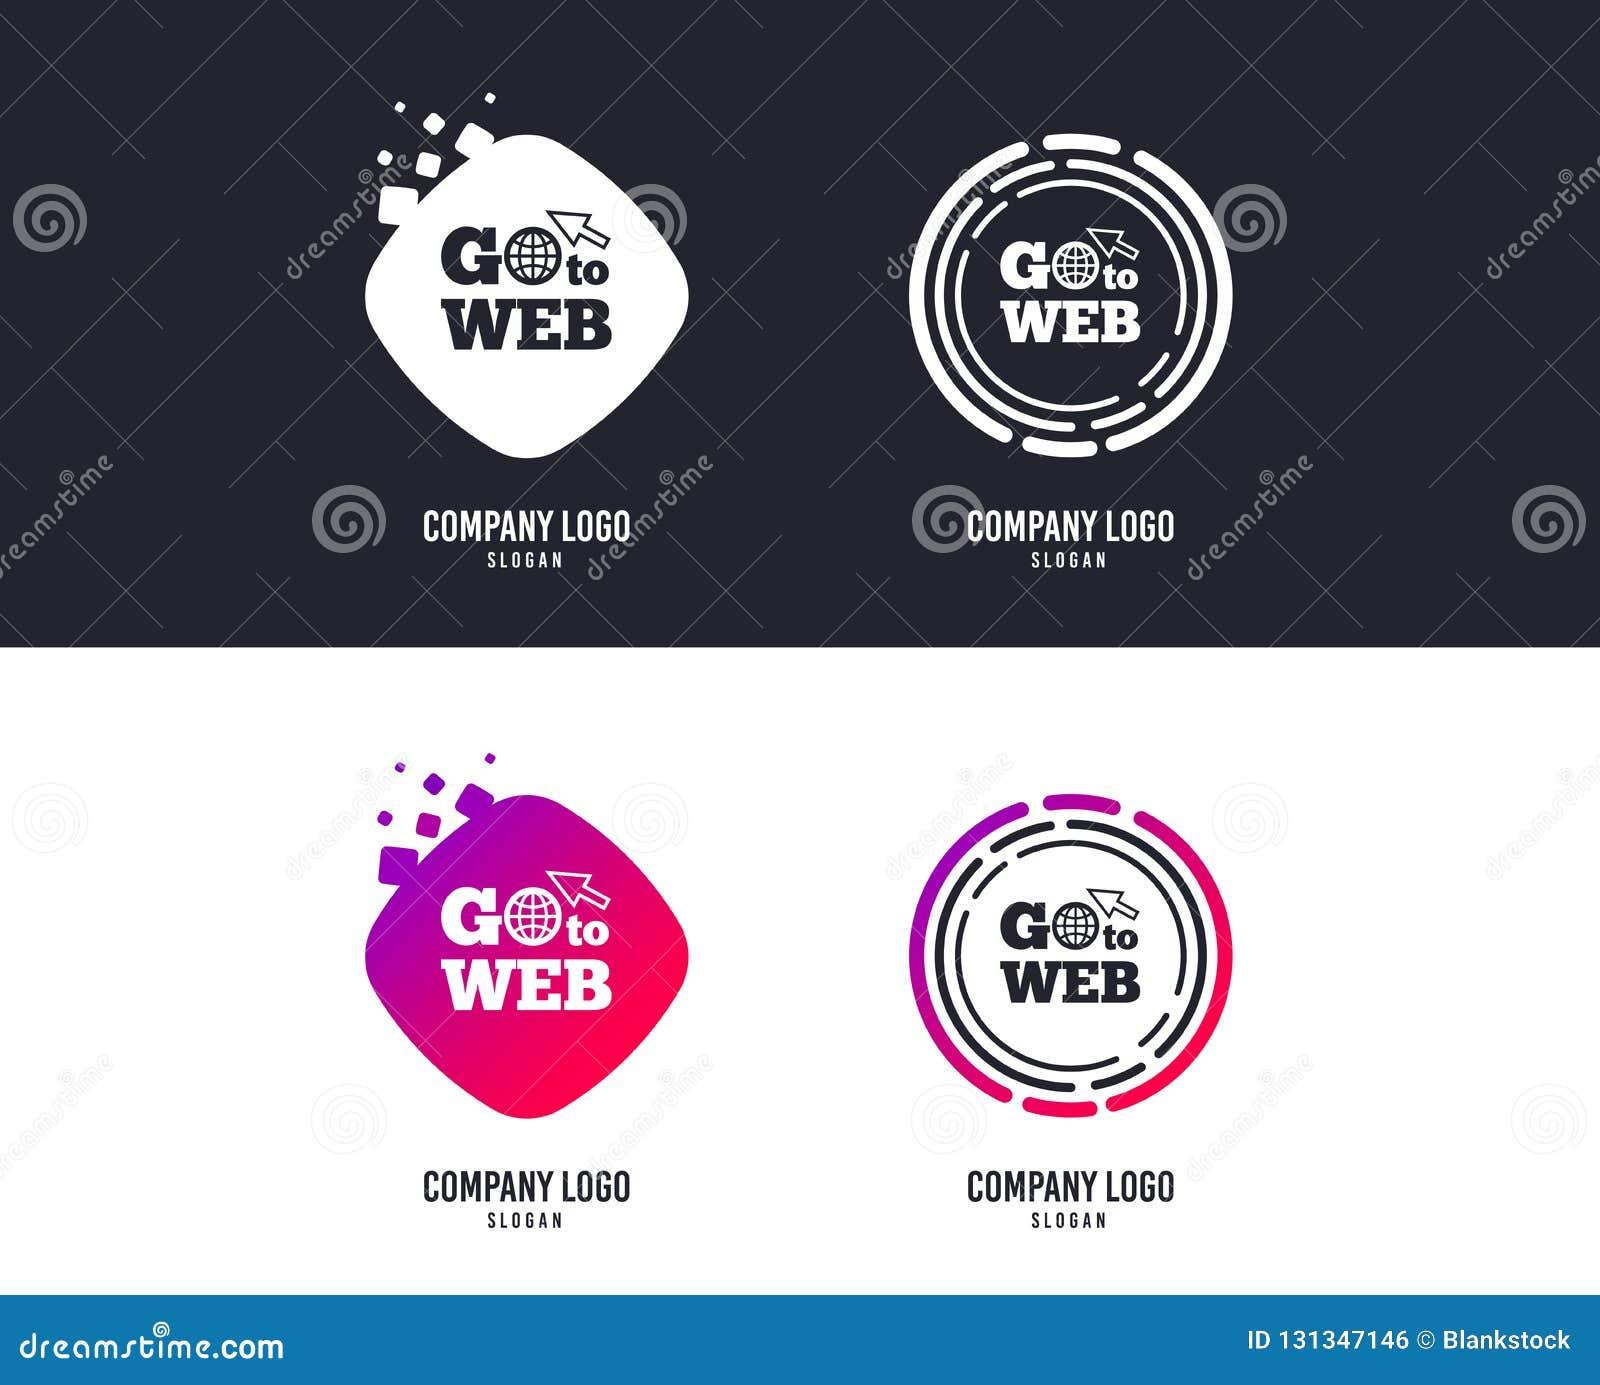 Go To Web Icon. Internet Access Symbol. Vector Stock ...